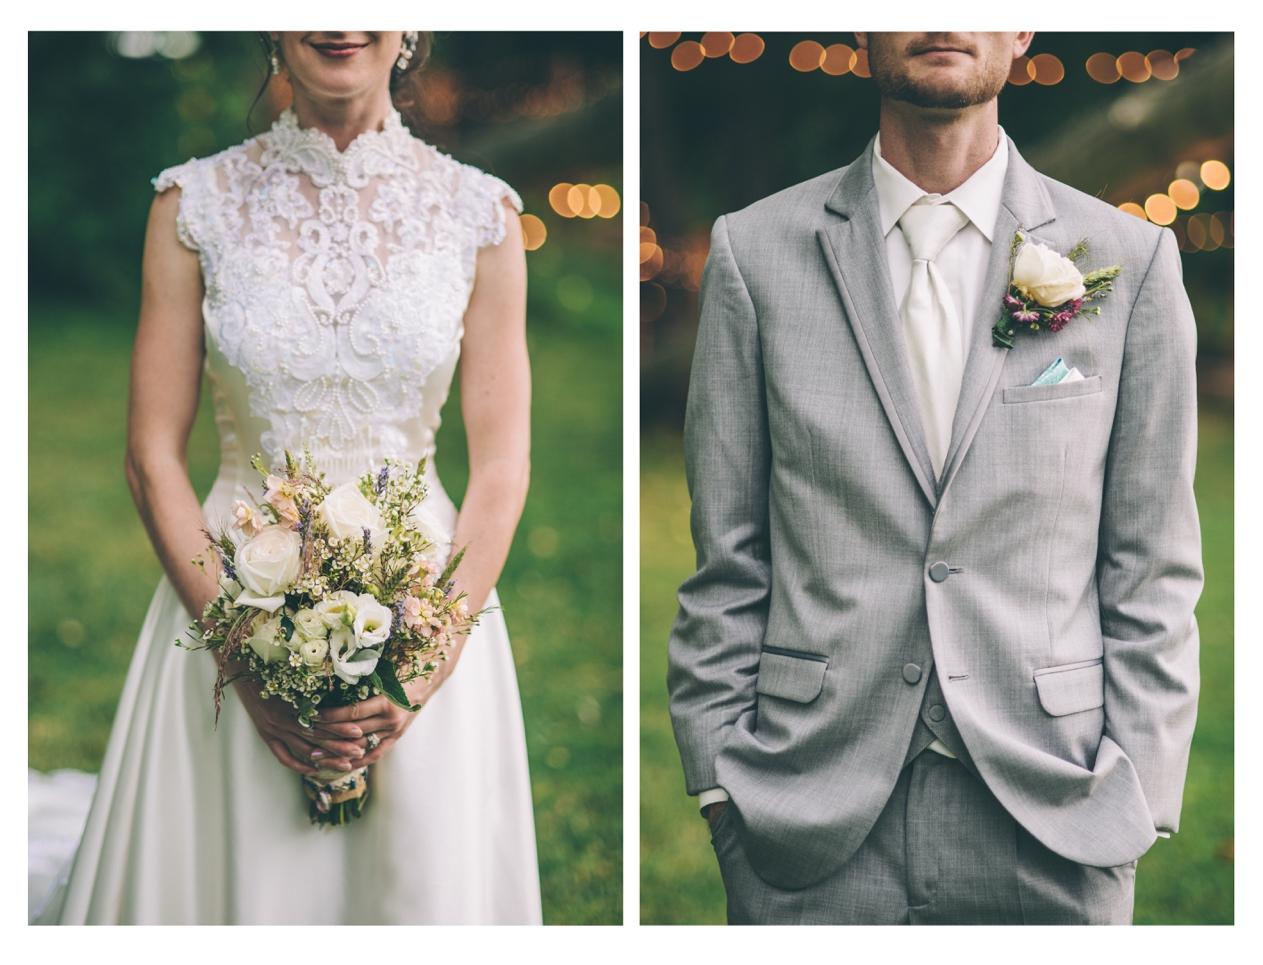 077-AmandaKoppImages-Colorado-Farm-Wedding-Photo.jpg